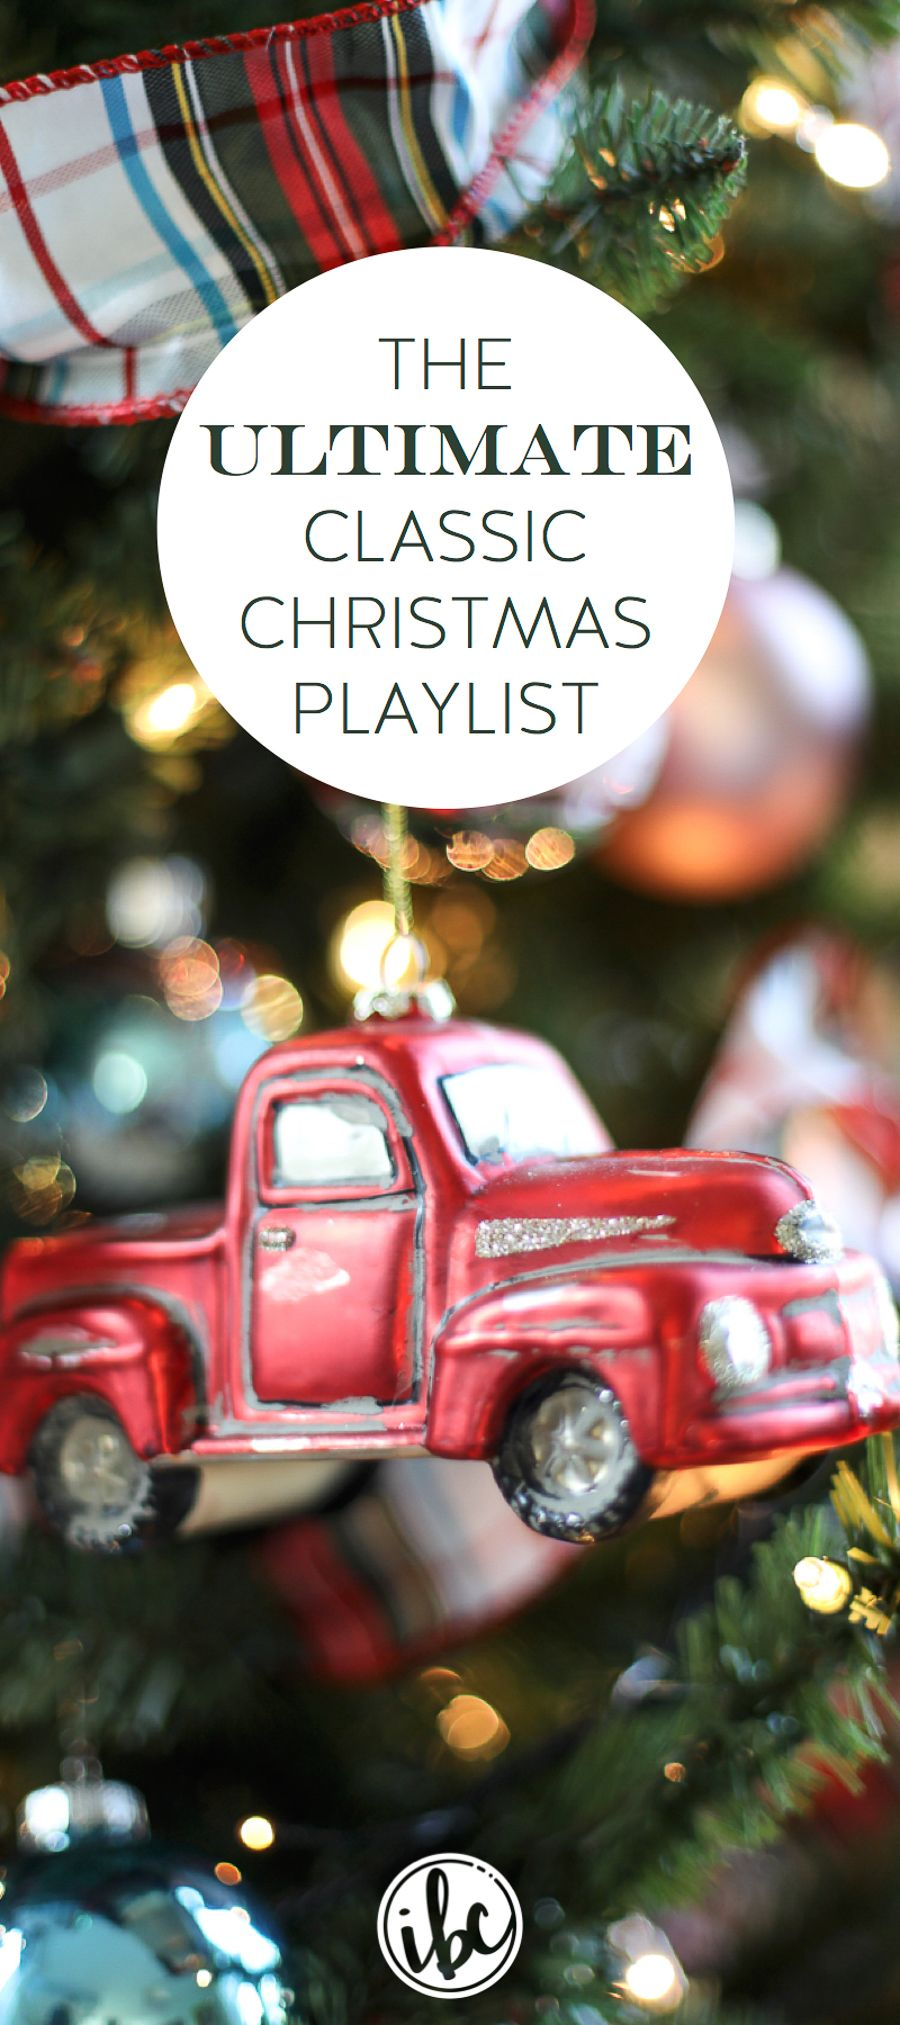 Christmas Music Playlist The Ultimate Classic Christmas